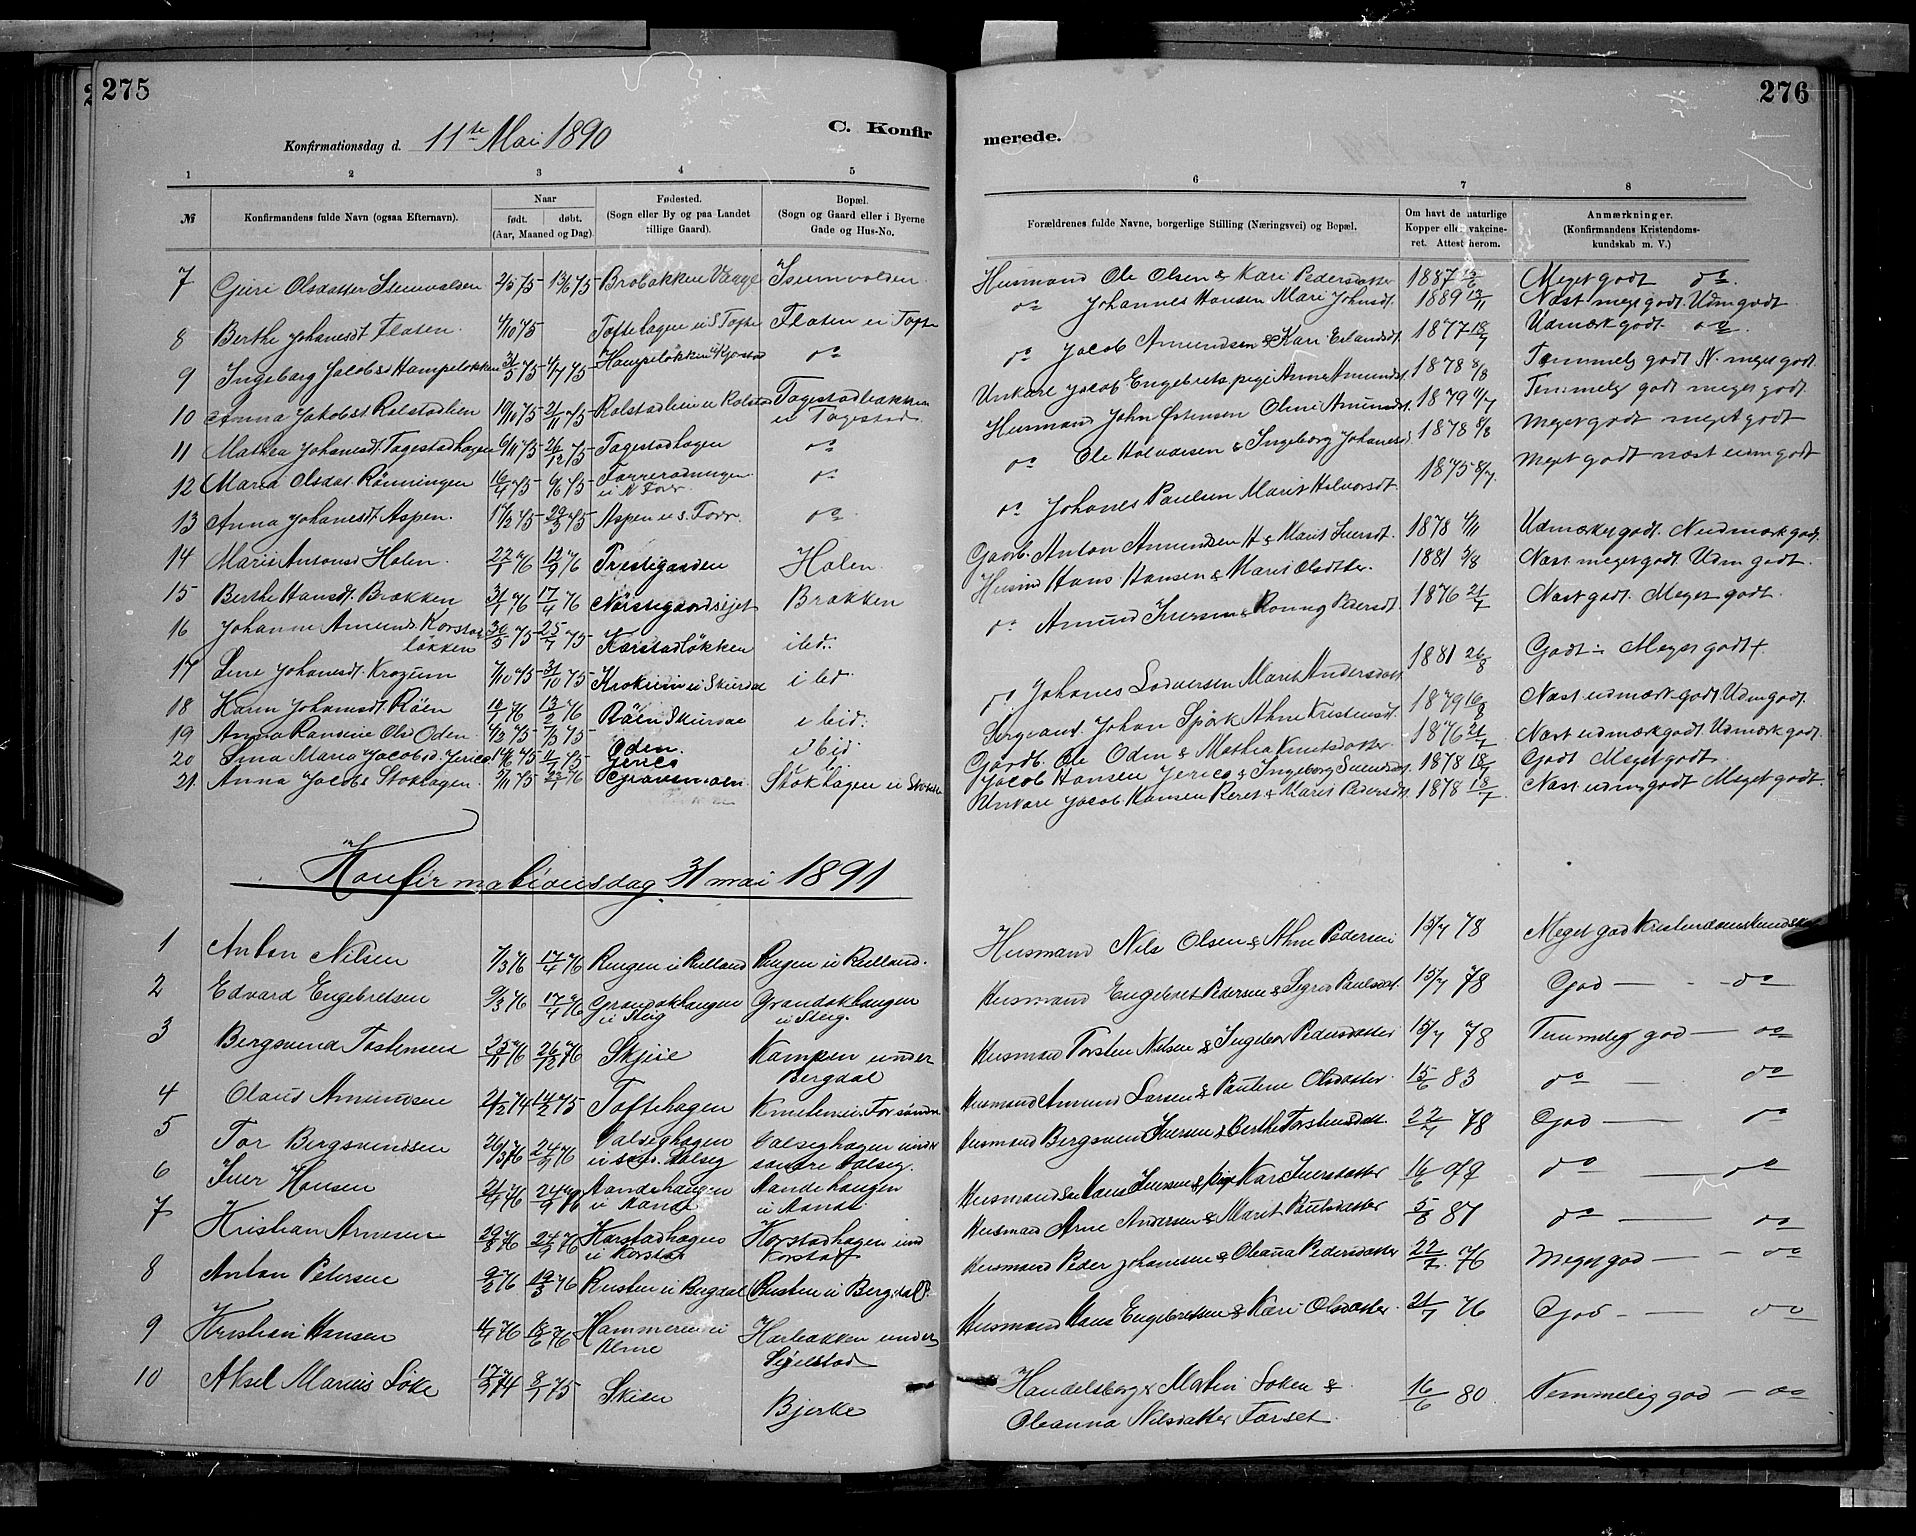 SAH, Sør-Fron prestekontor, H/Ha/Hab/L0003: Klokkerbok nr. 3, 1884-1896, s. 275-276